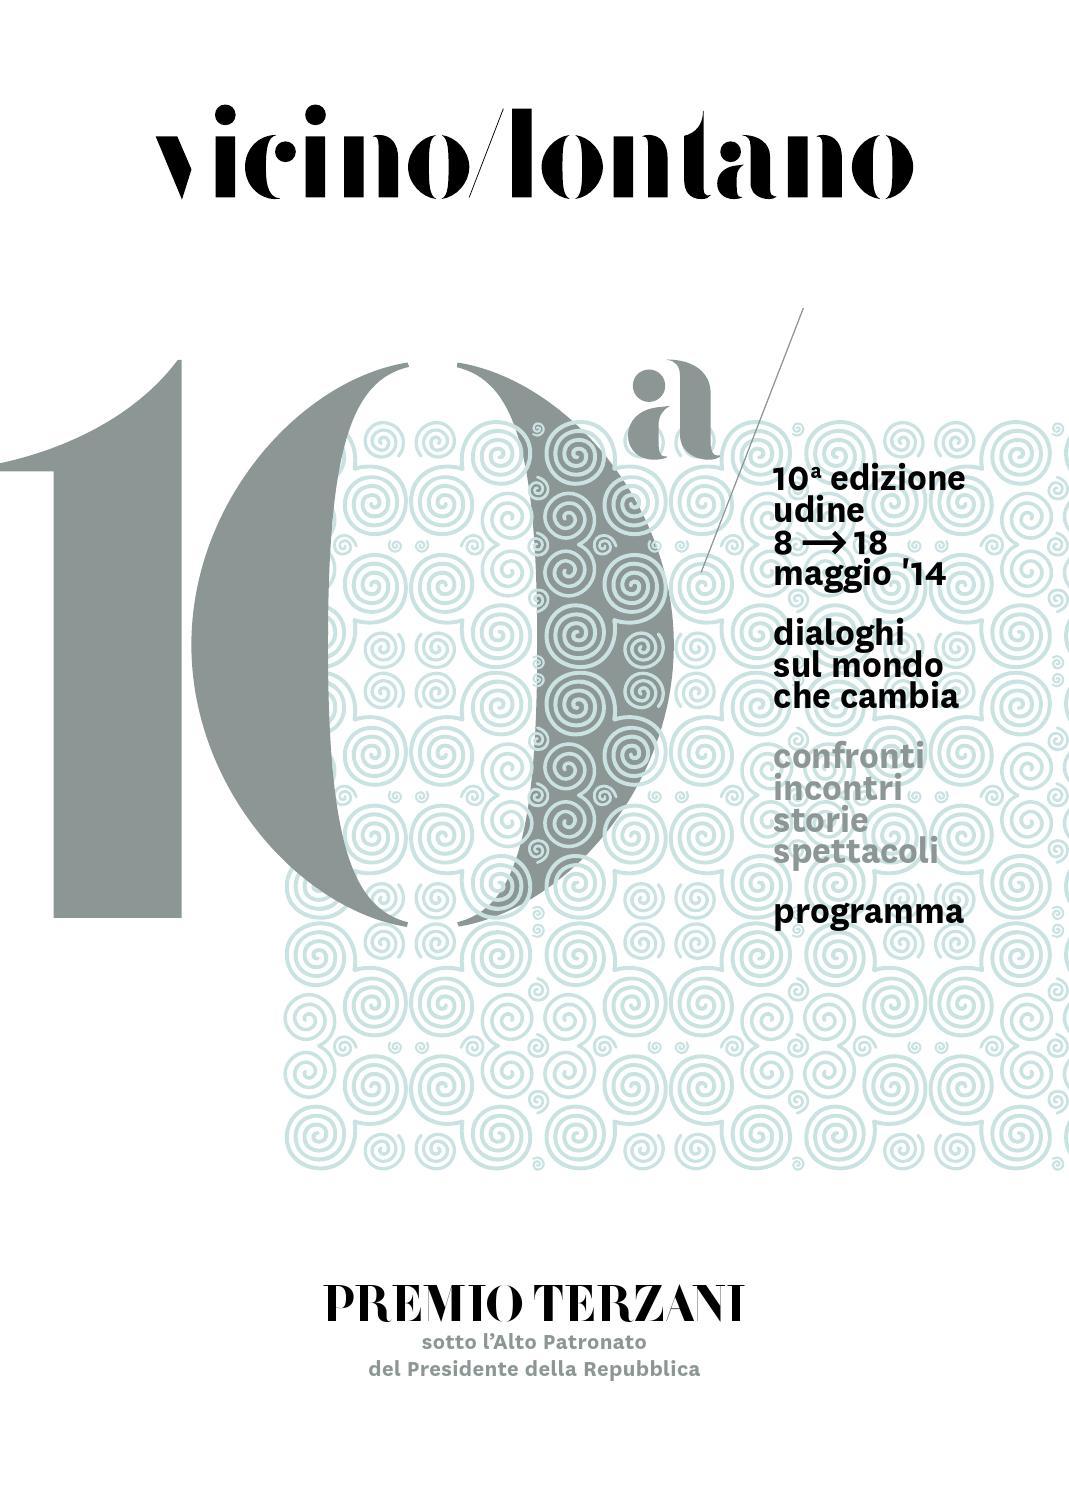 Programma vicinolontano 2014 by Paolo Ermano  Issuu